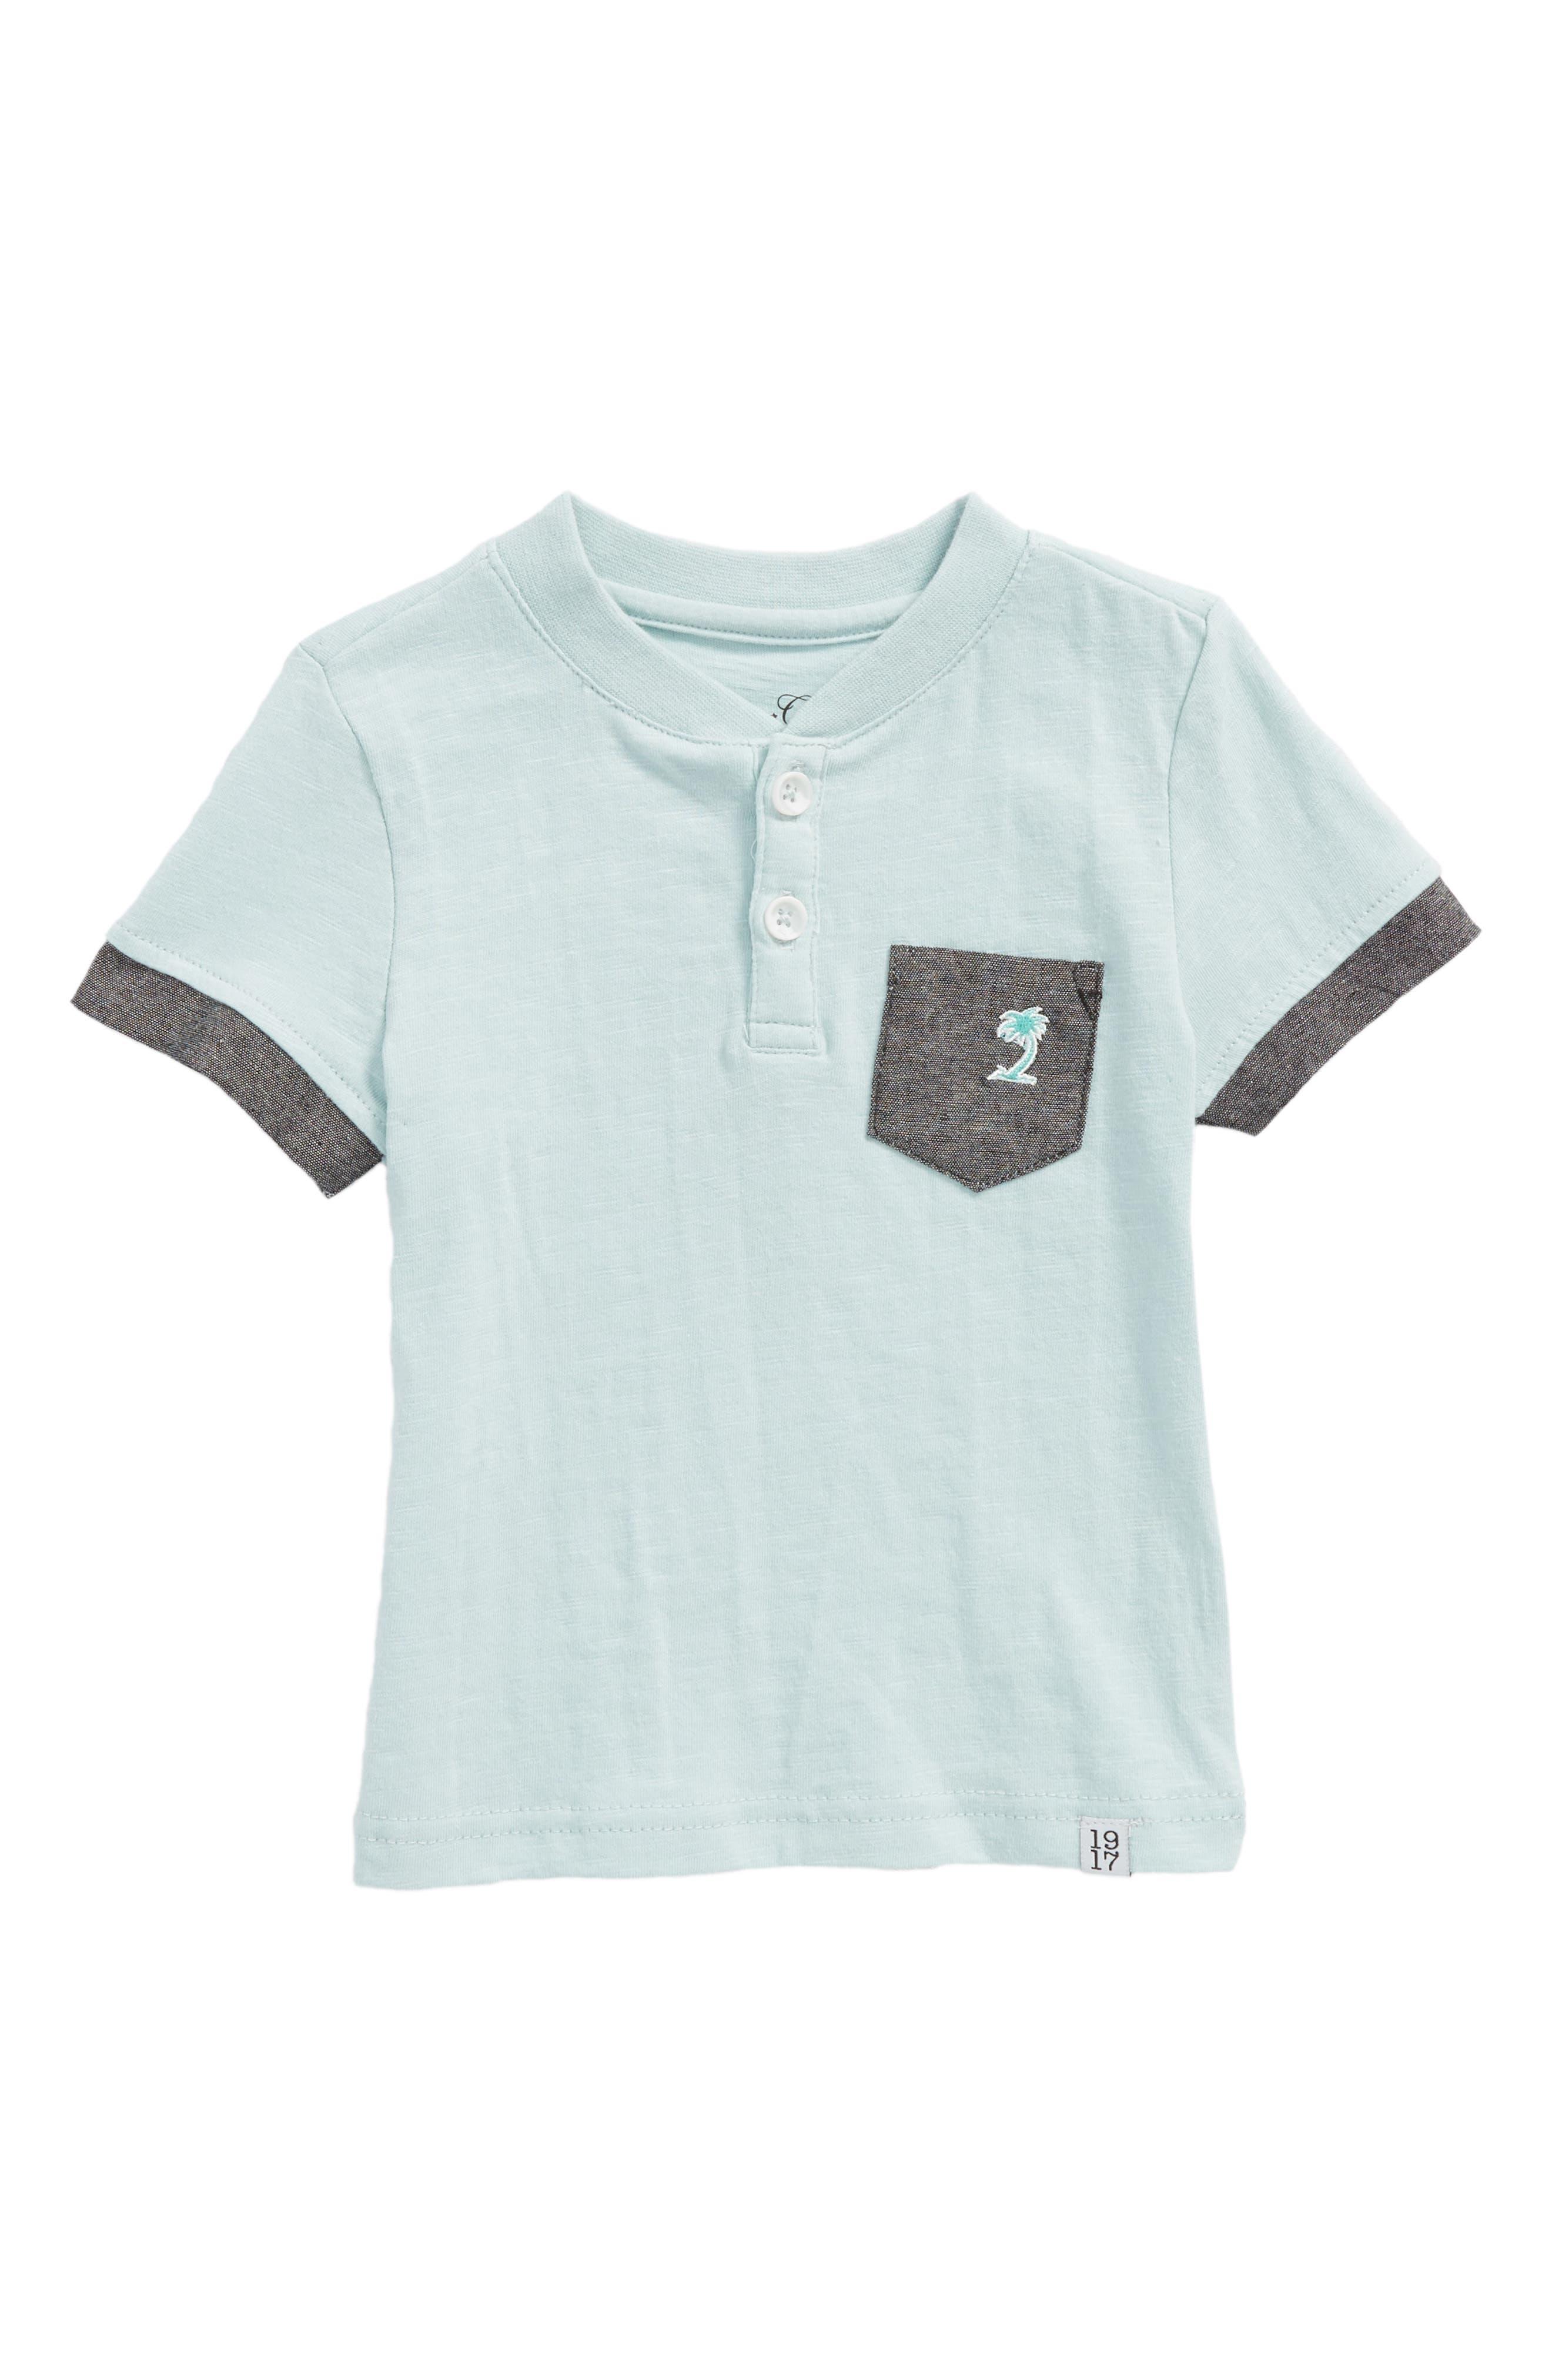 Alternate Image 1 Selected - Sovereign Code Goodlife T-Shirt (Baby Boys)